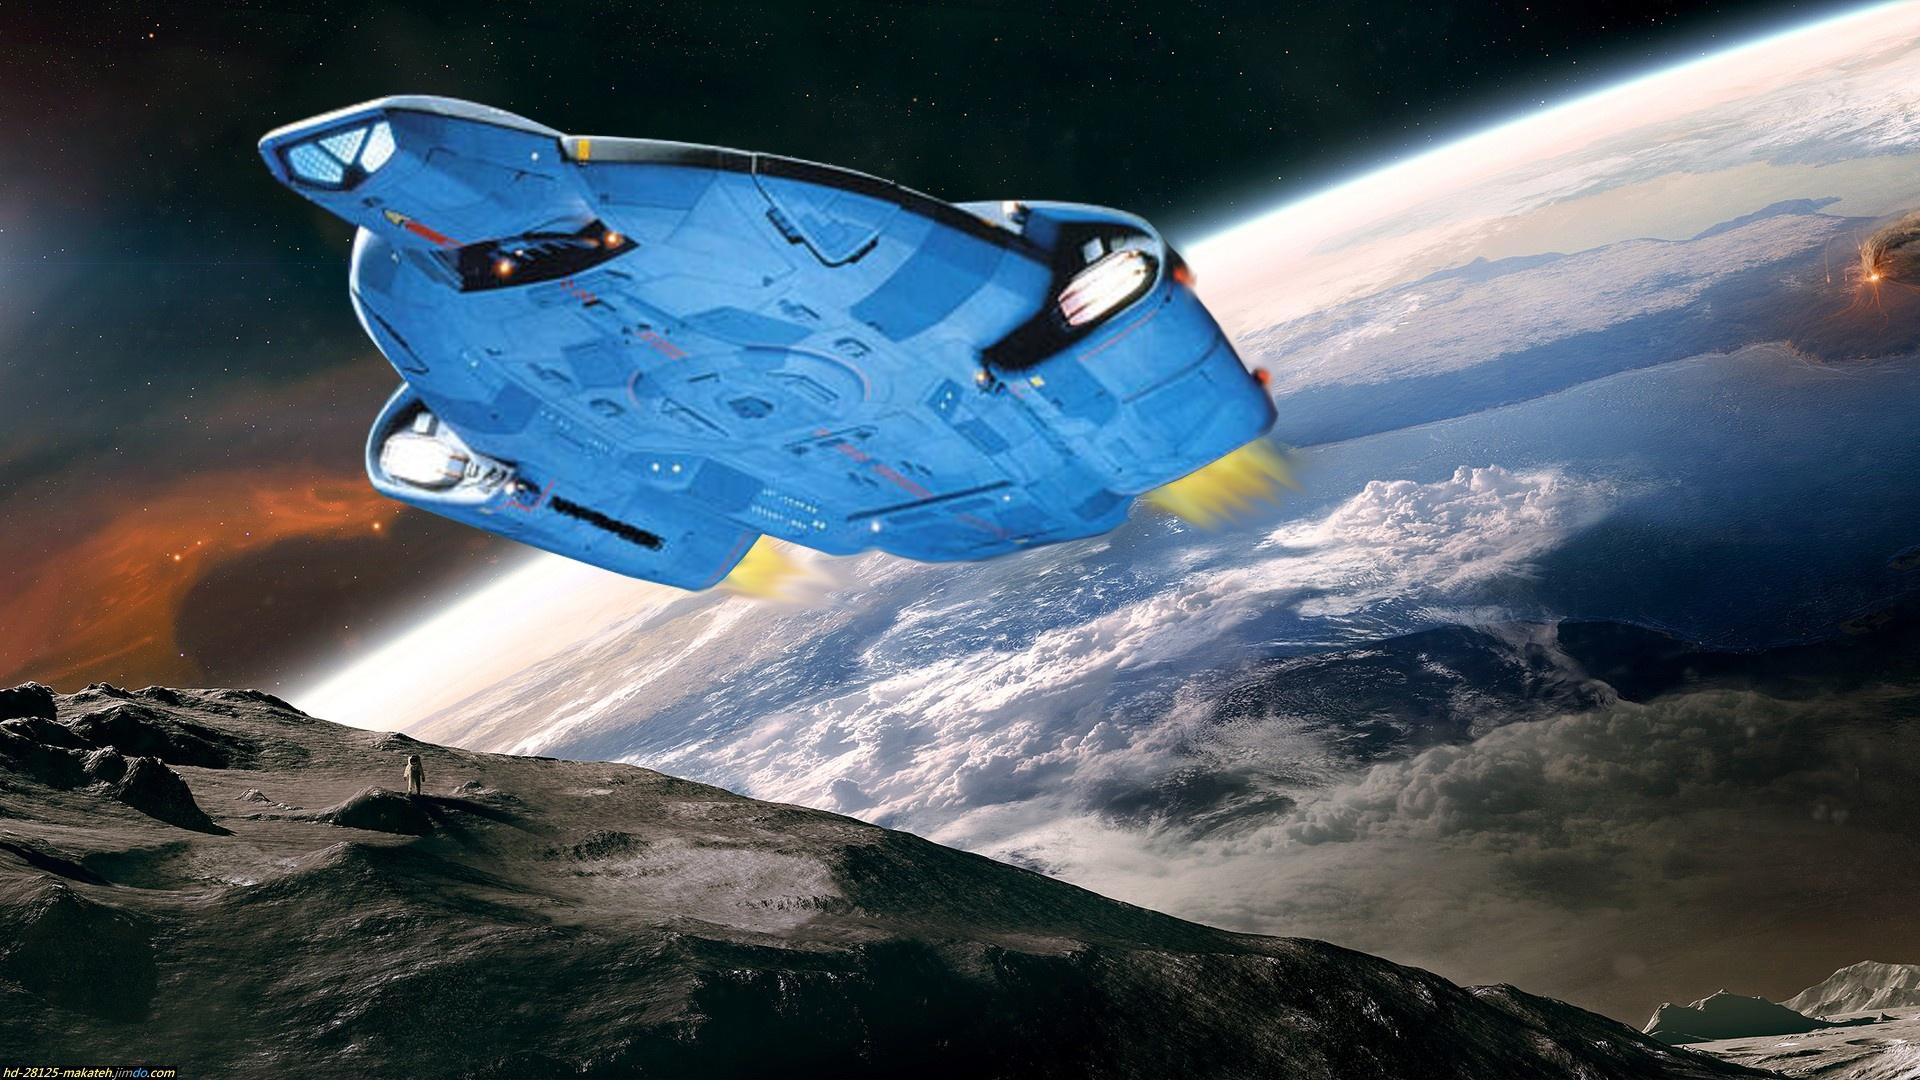 Star trek hd wallpaper background image 1920x1080 id - Spaceship wallpaper ...